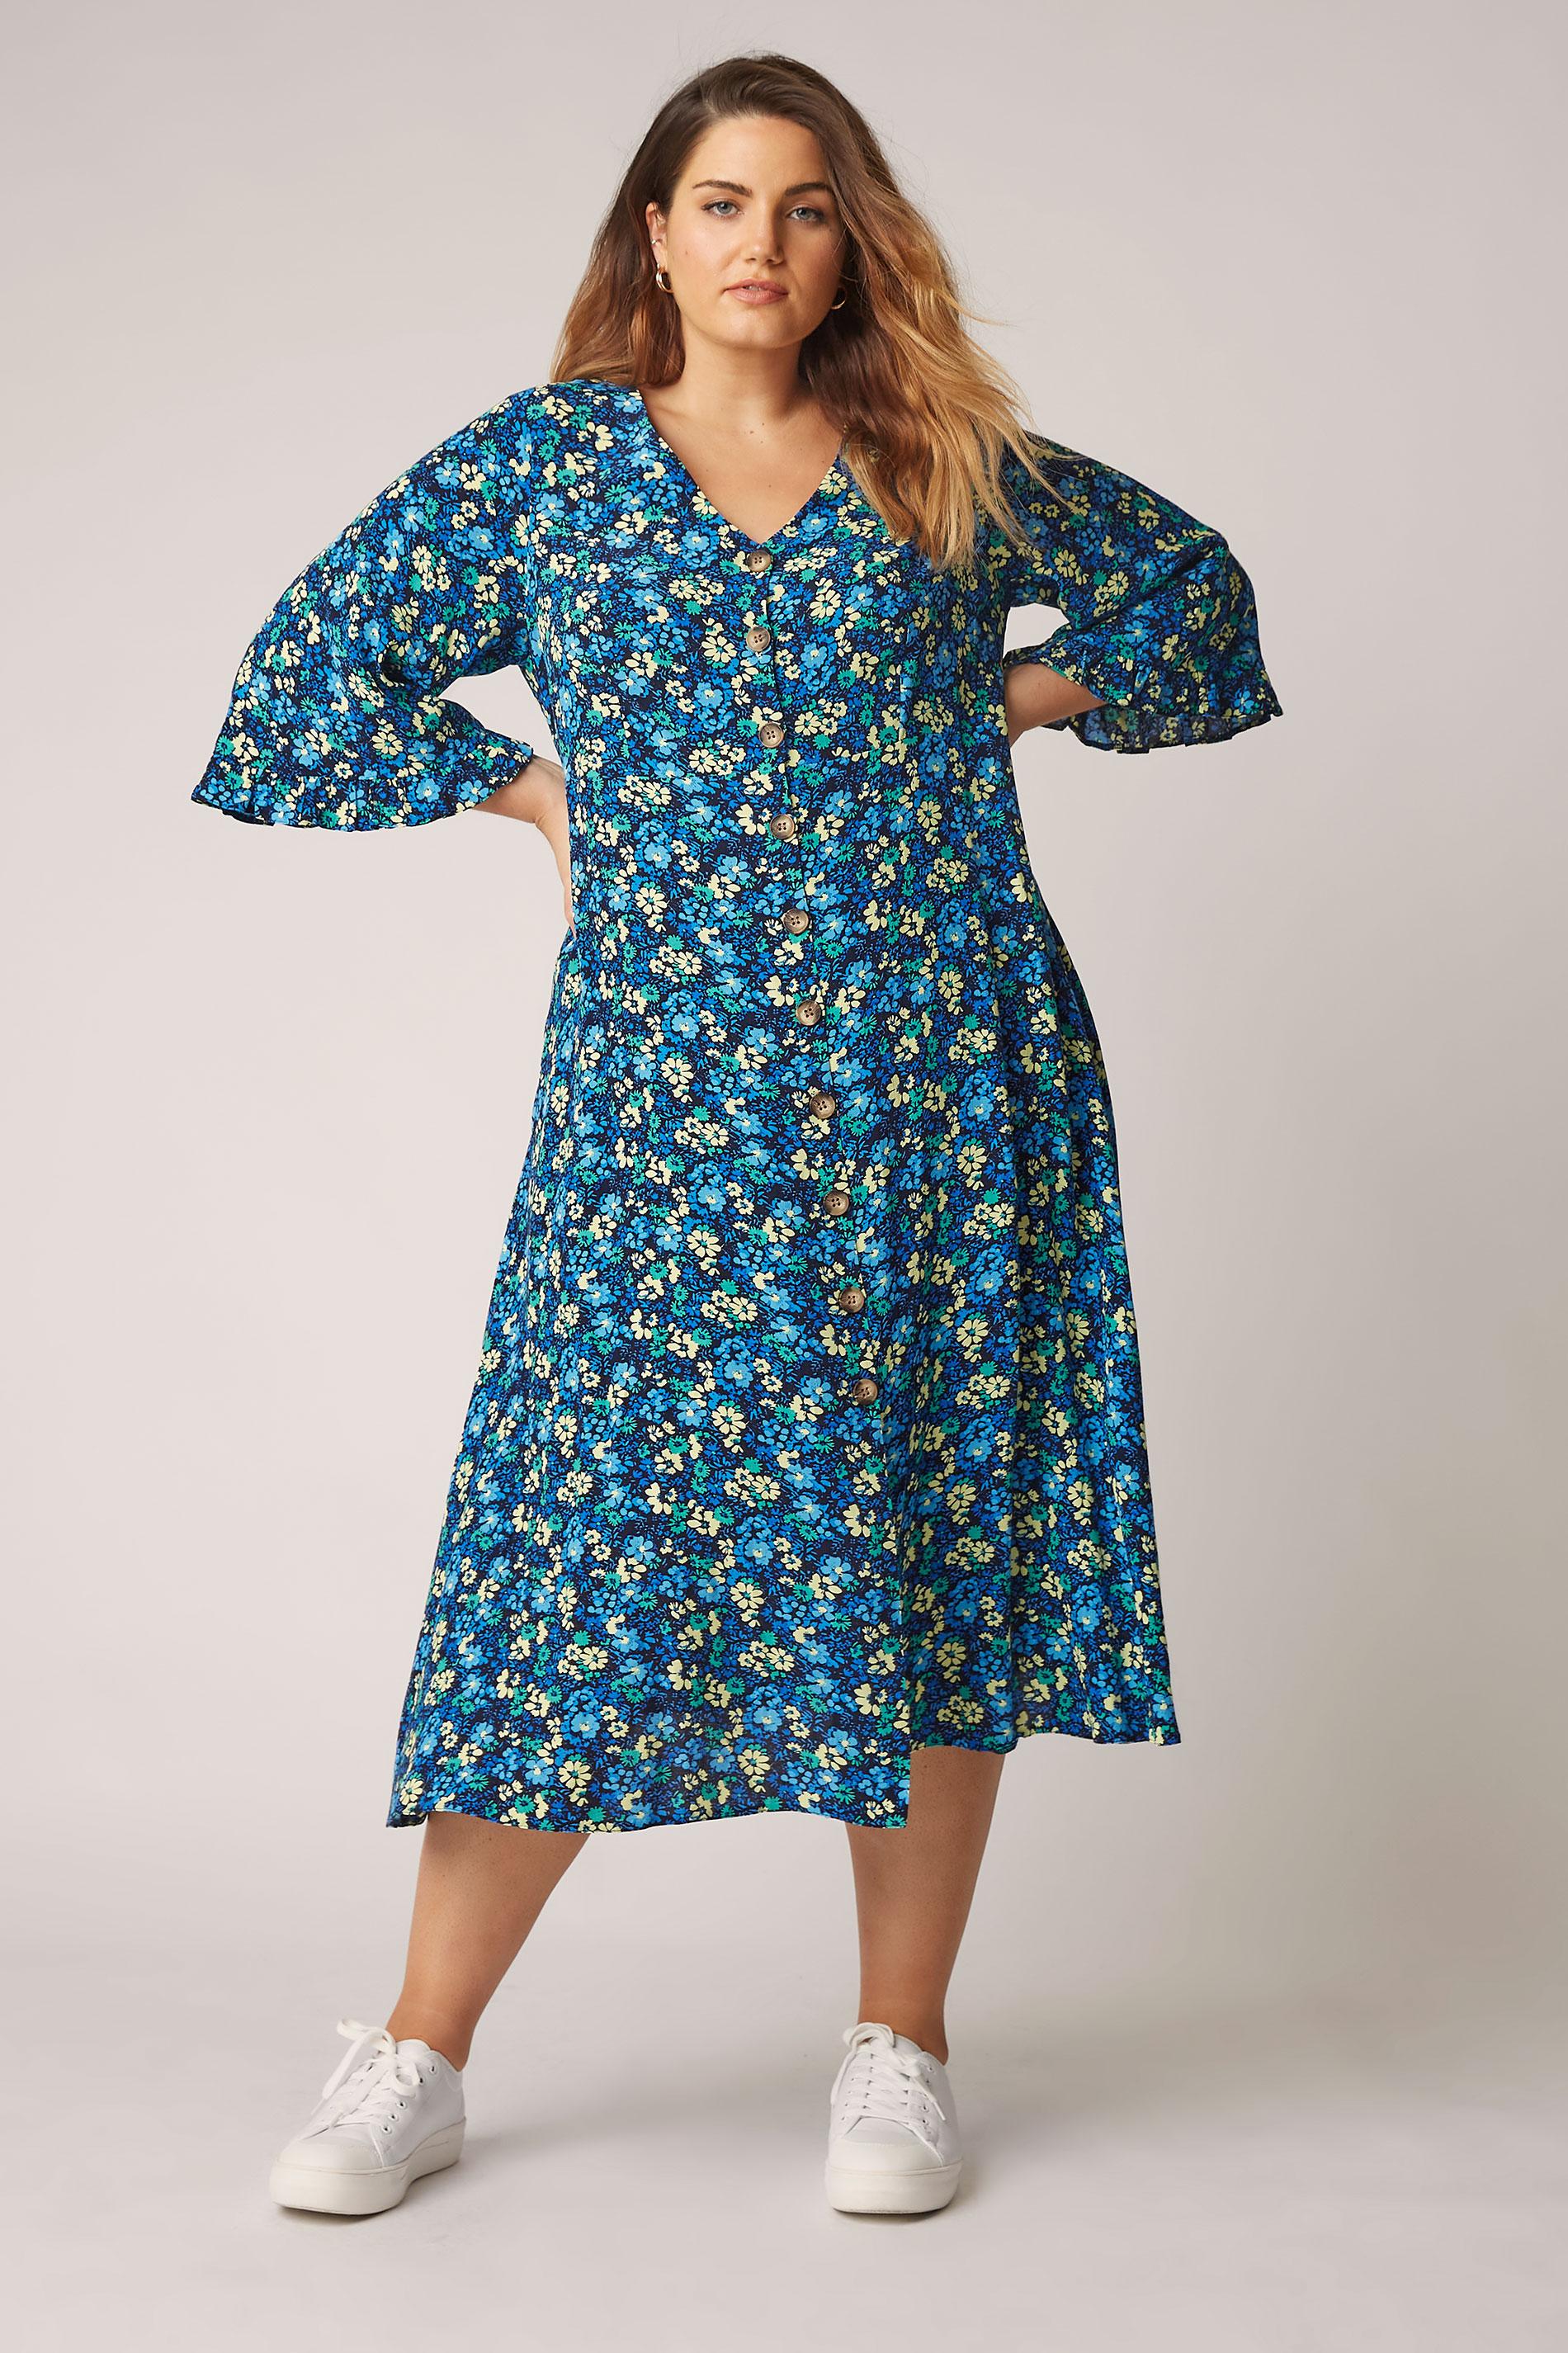 THE LIMITED EDIT Blue Floral Midaxi Dress_A.jpg